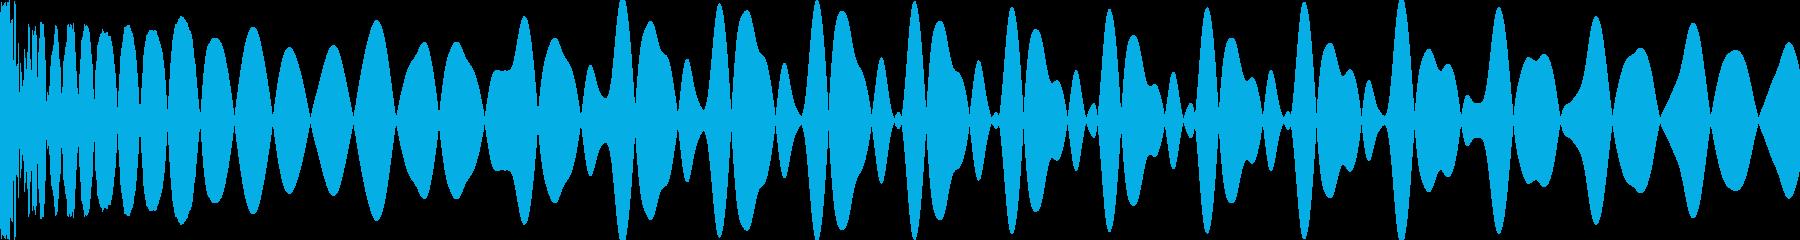 EDMキー入り(E)キックです。の再生済みの波形